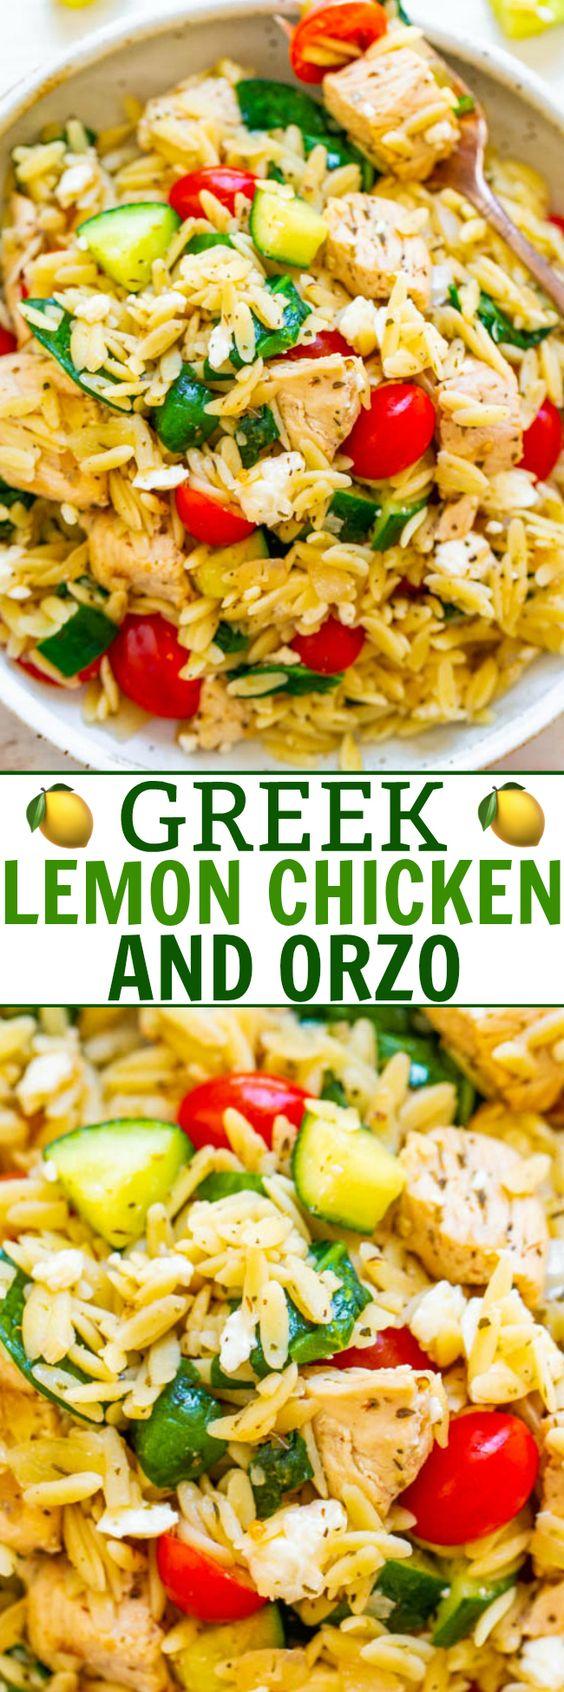 Greek Lemon Chicken and Orzo